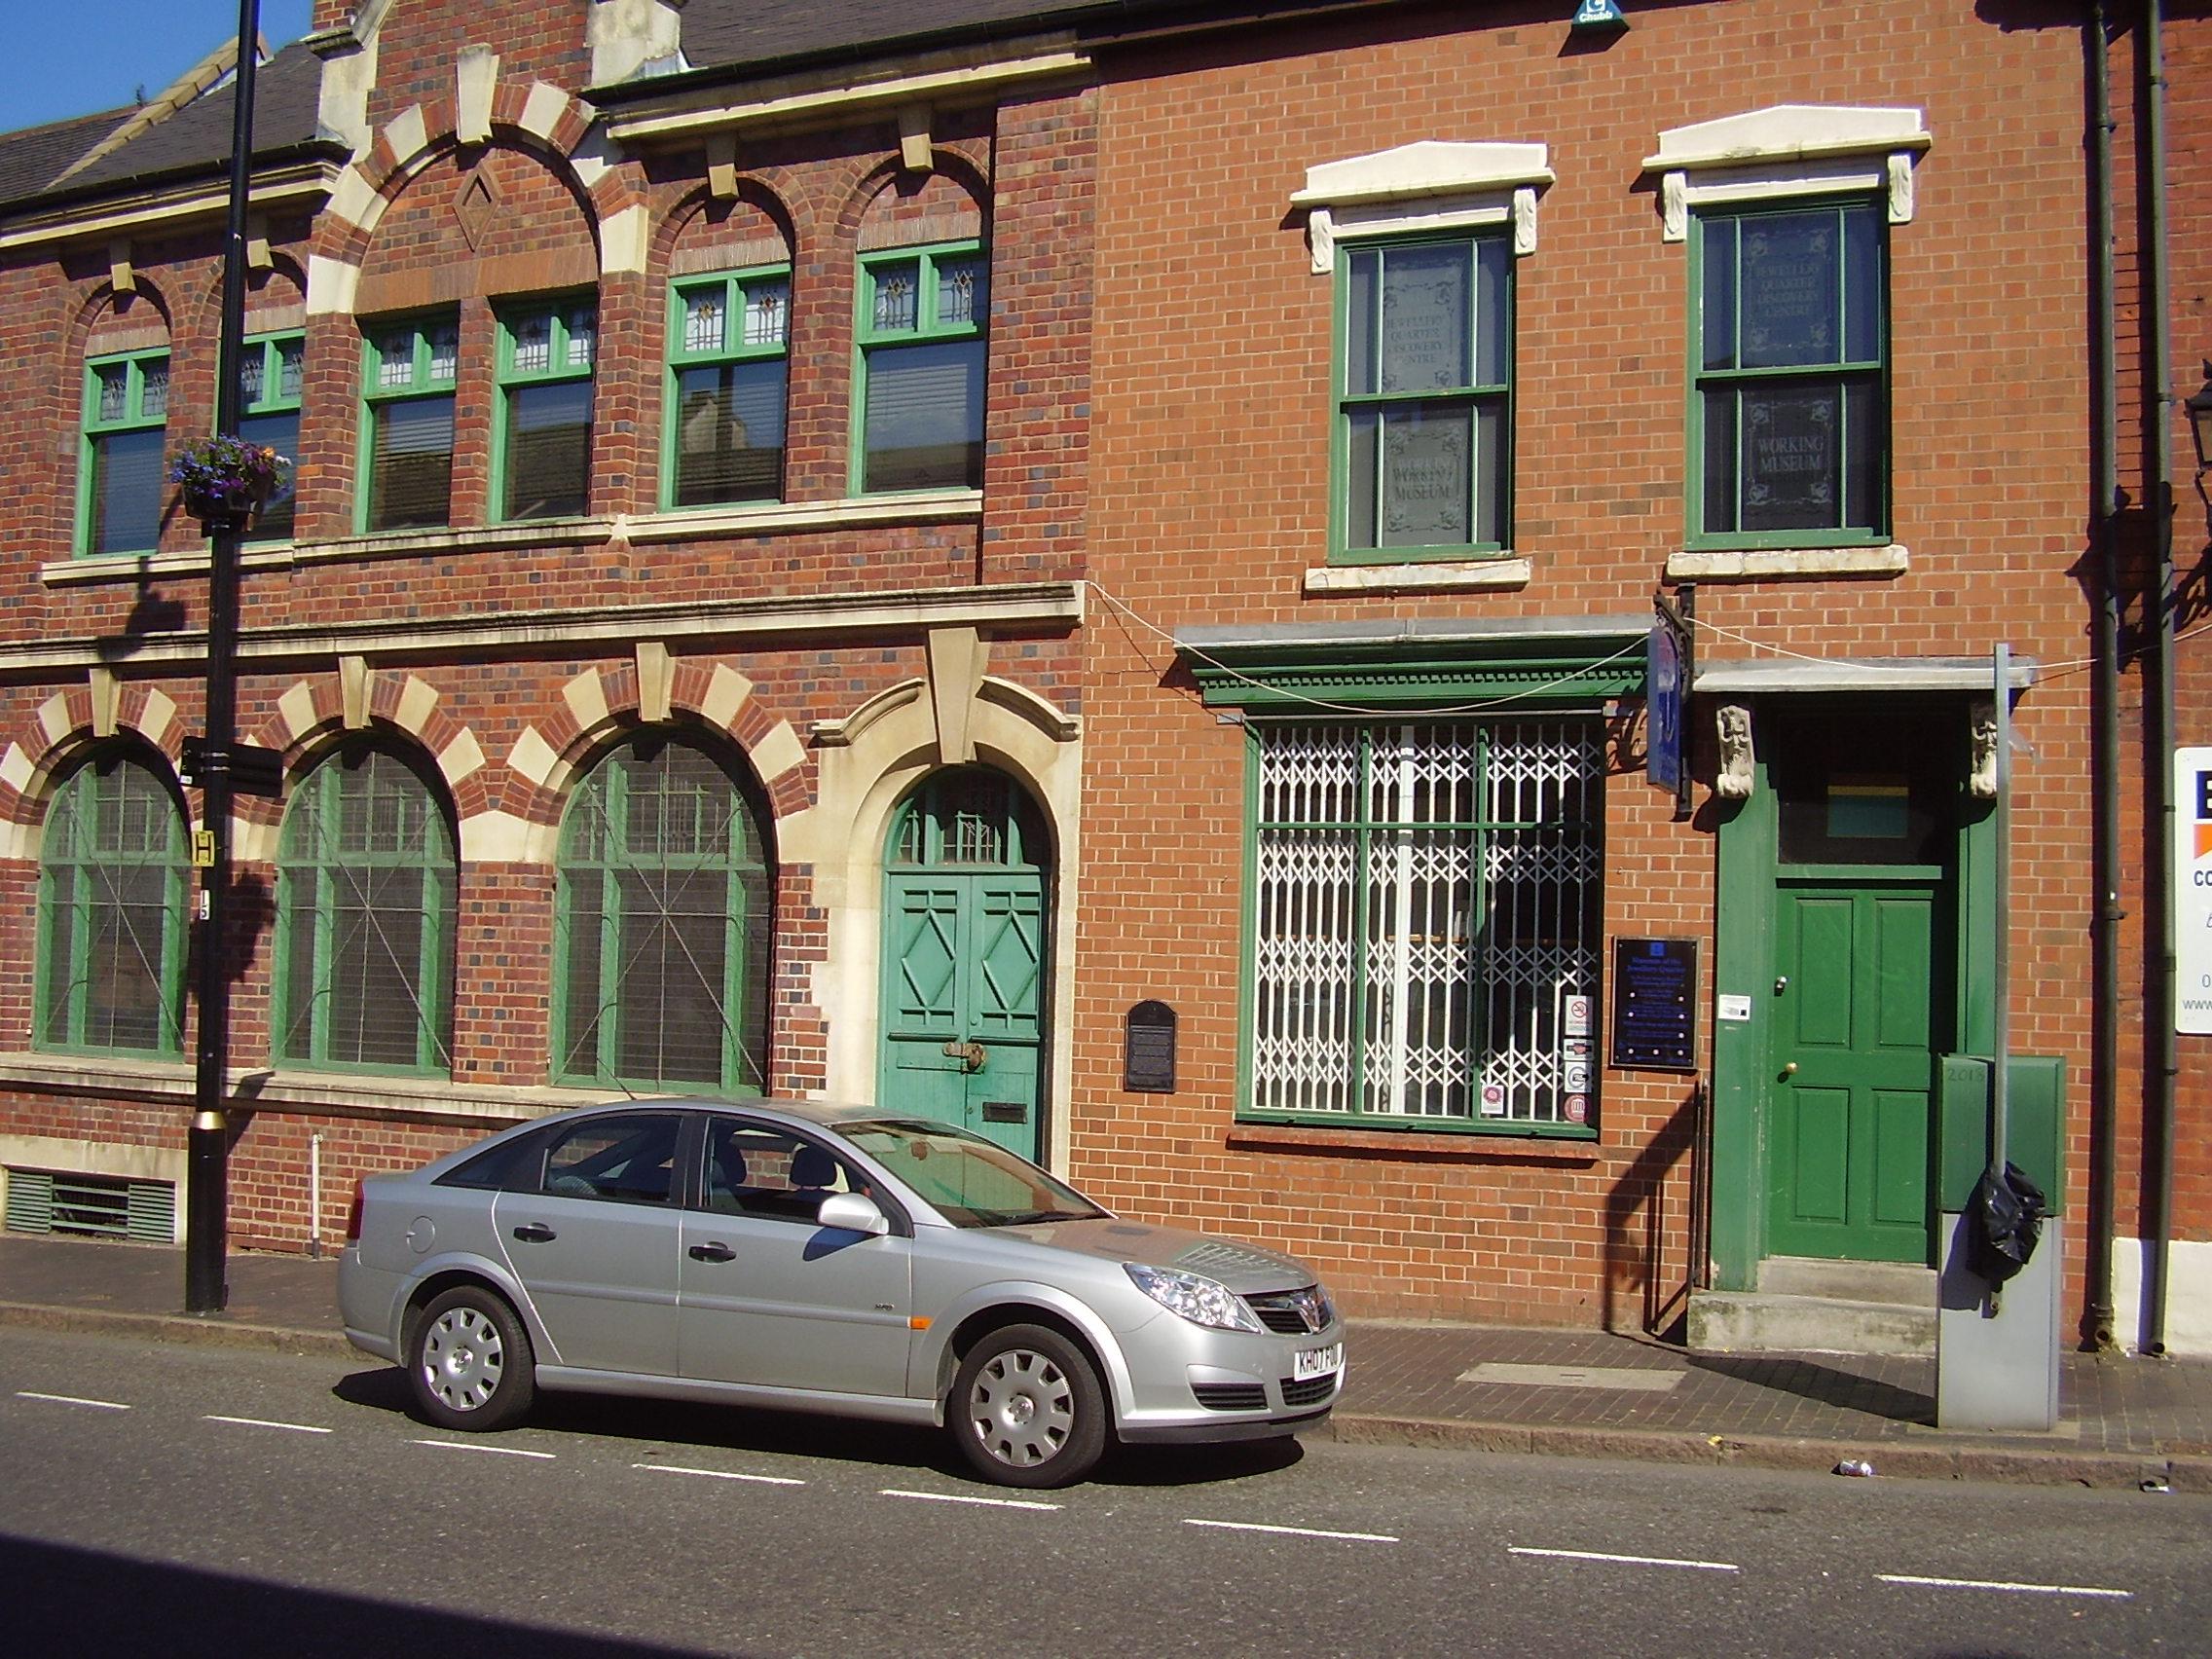 2008 Outside Museum of the Jewellery Quarter 75-80 Vyse St, Birmingham B18 6HA, UK